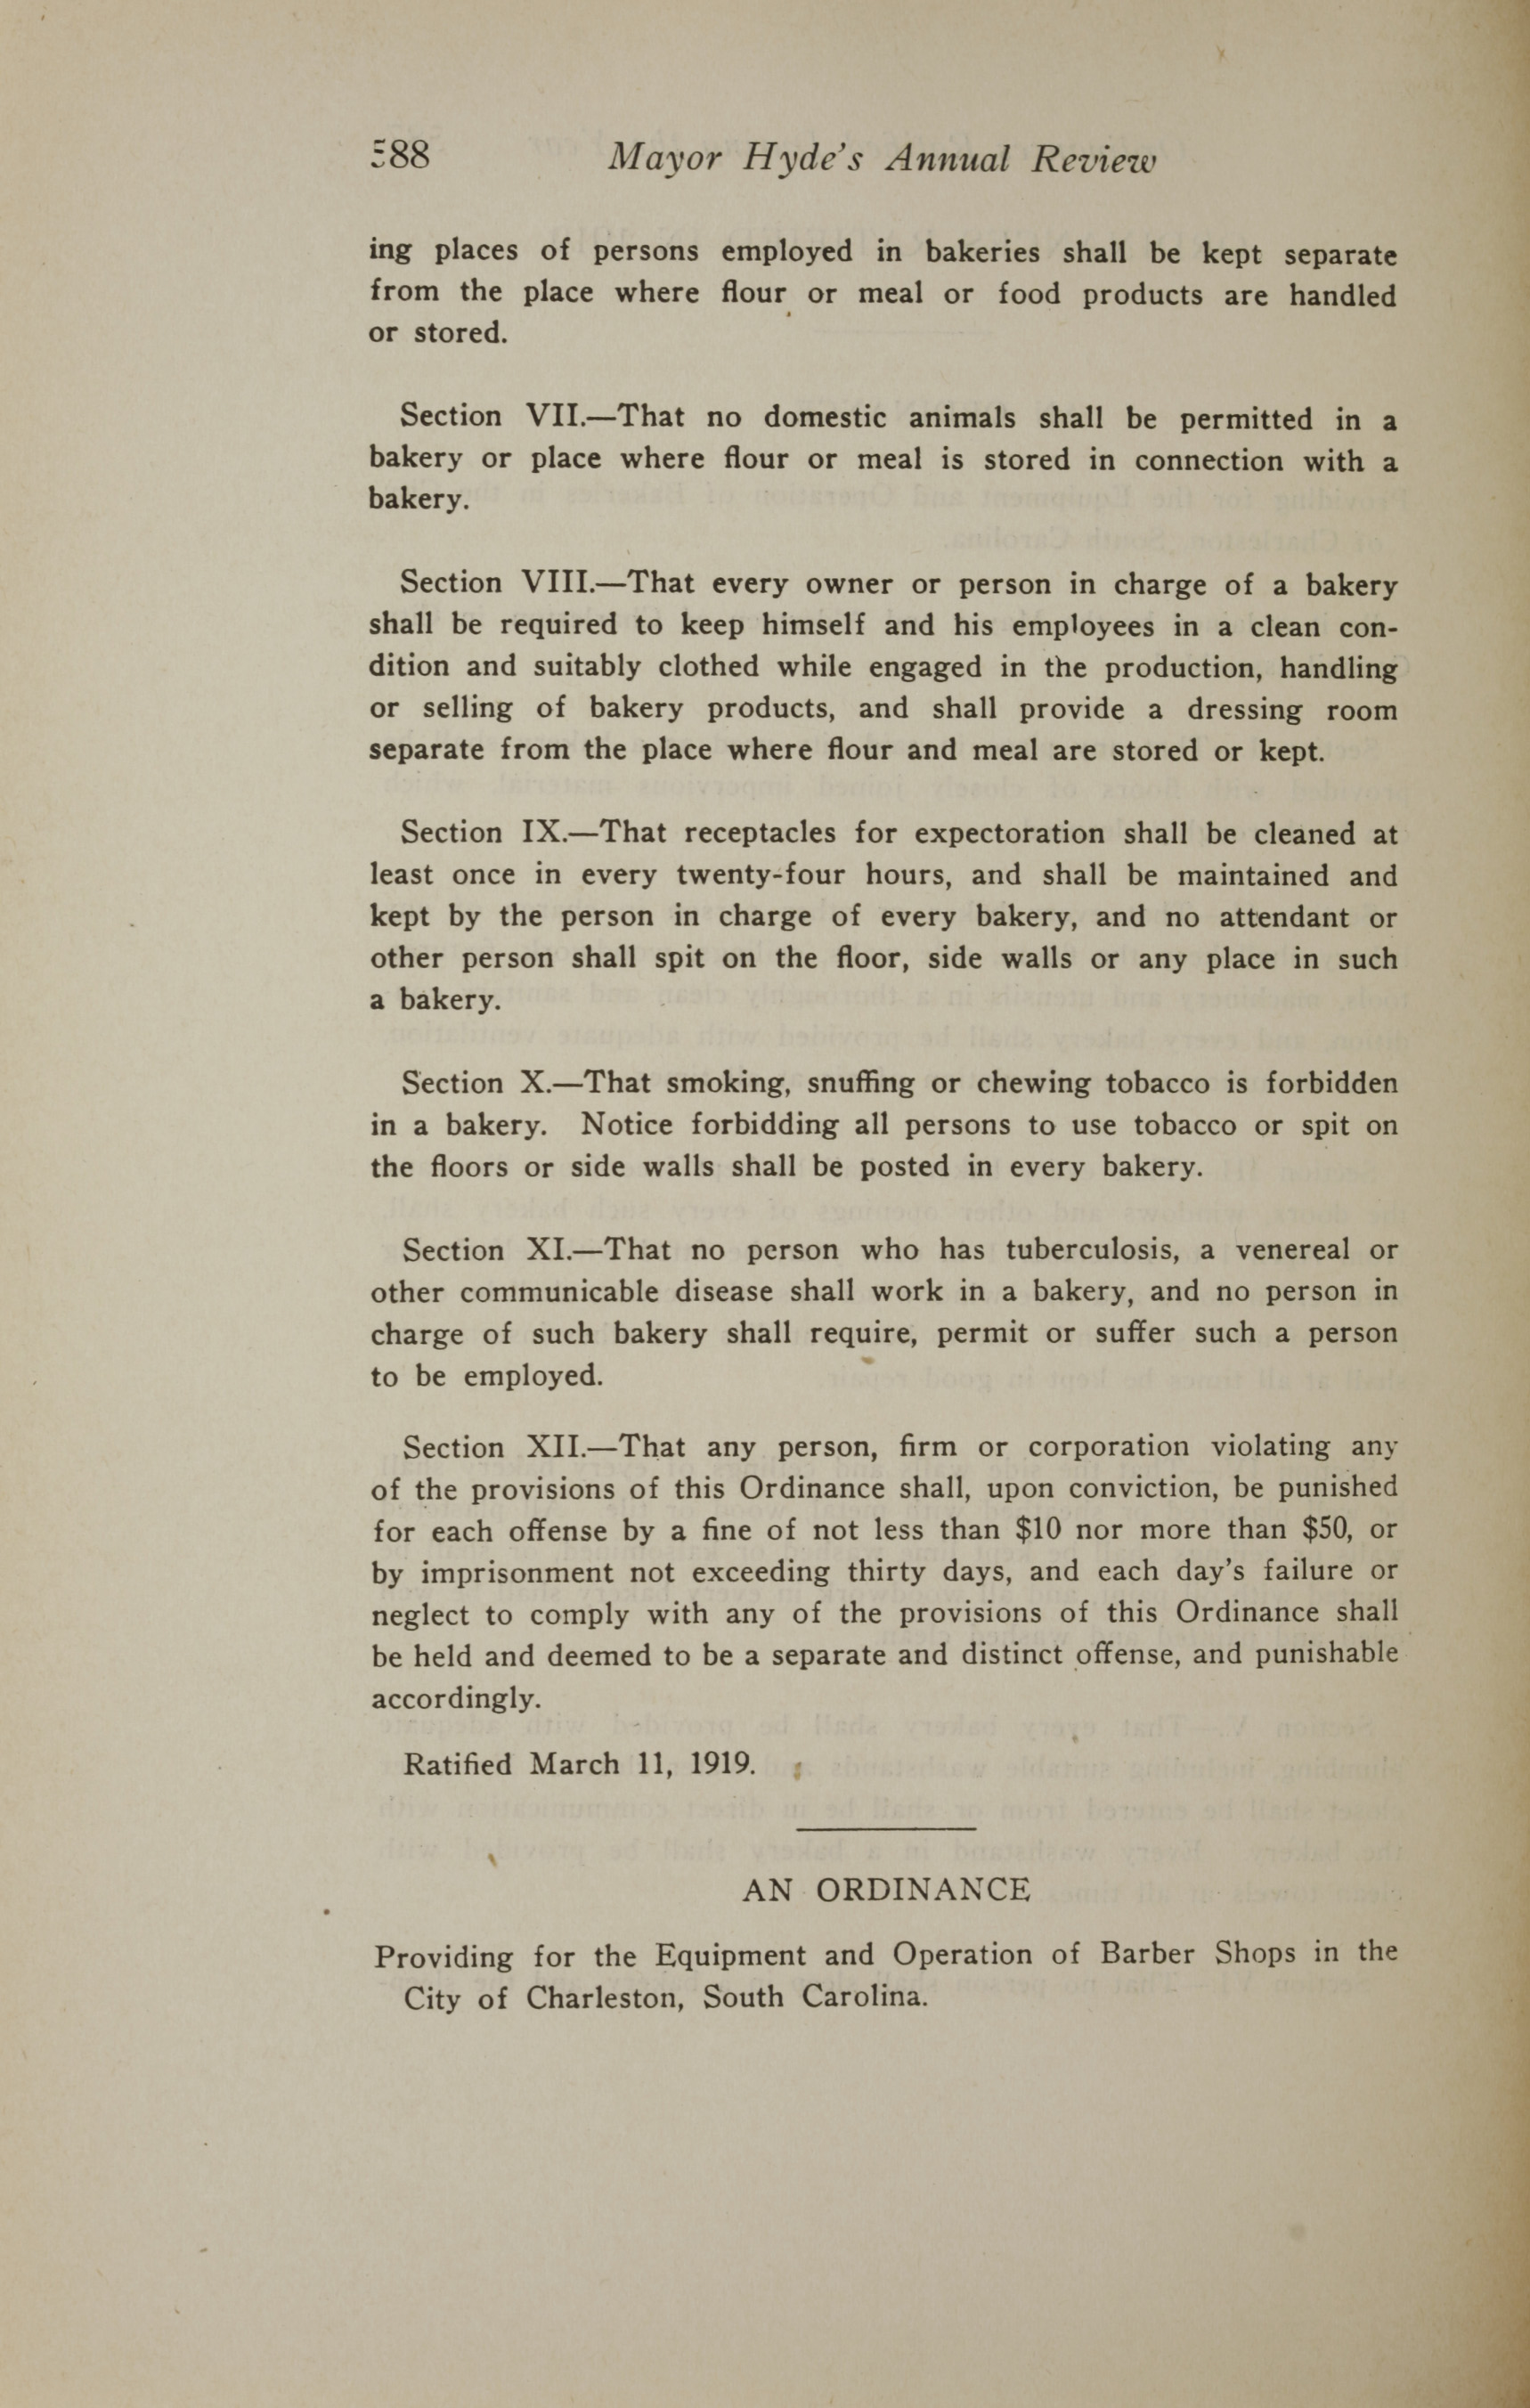 Charleston Yearbook, 1919, page 588